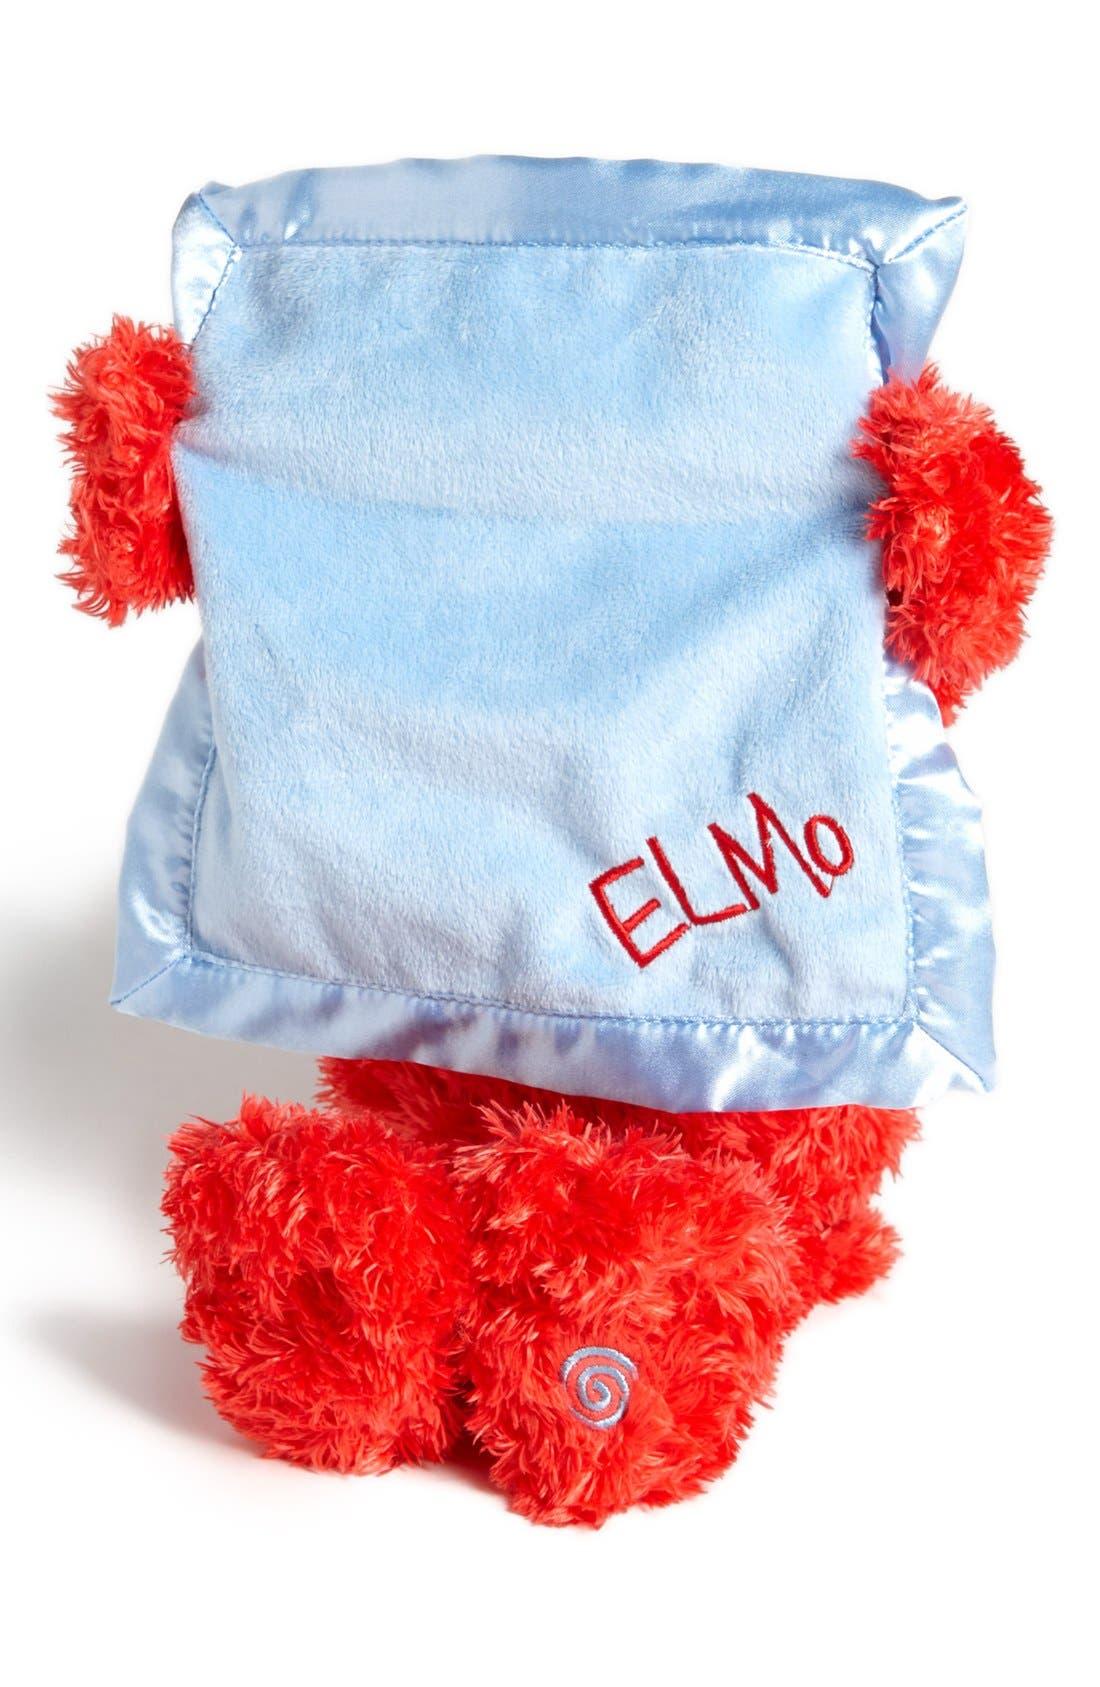 'Sesame Street<sup>®</sup> Peek-A-Boo Elmo<sup>™</sup>' Talking Plush Toy,                             Alternate thumbnail 2, color,                             600